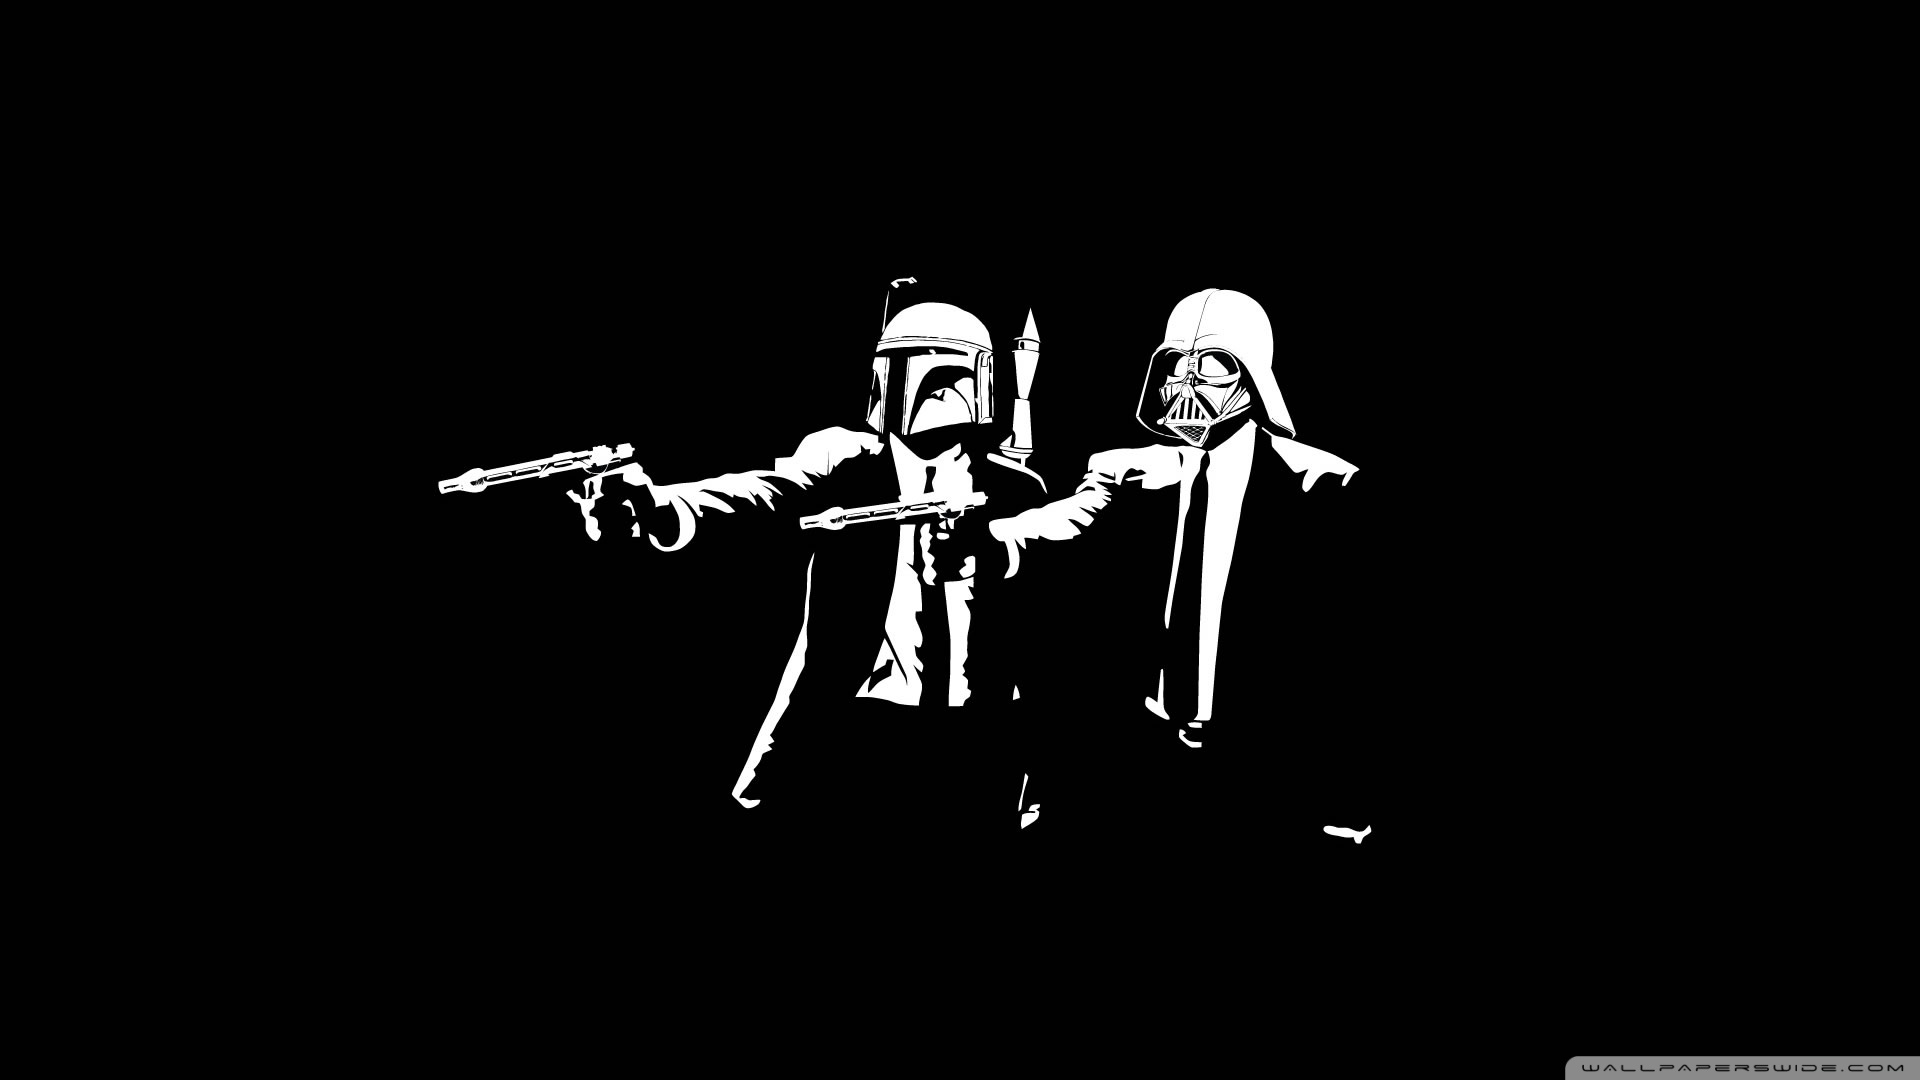 Star Wars Pulp Fiction HD desktop wallpaper : High Definition